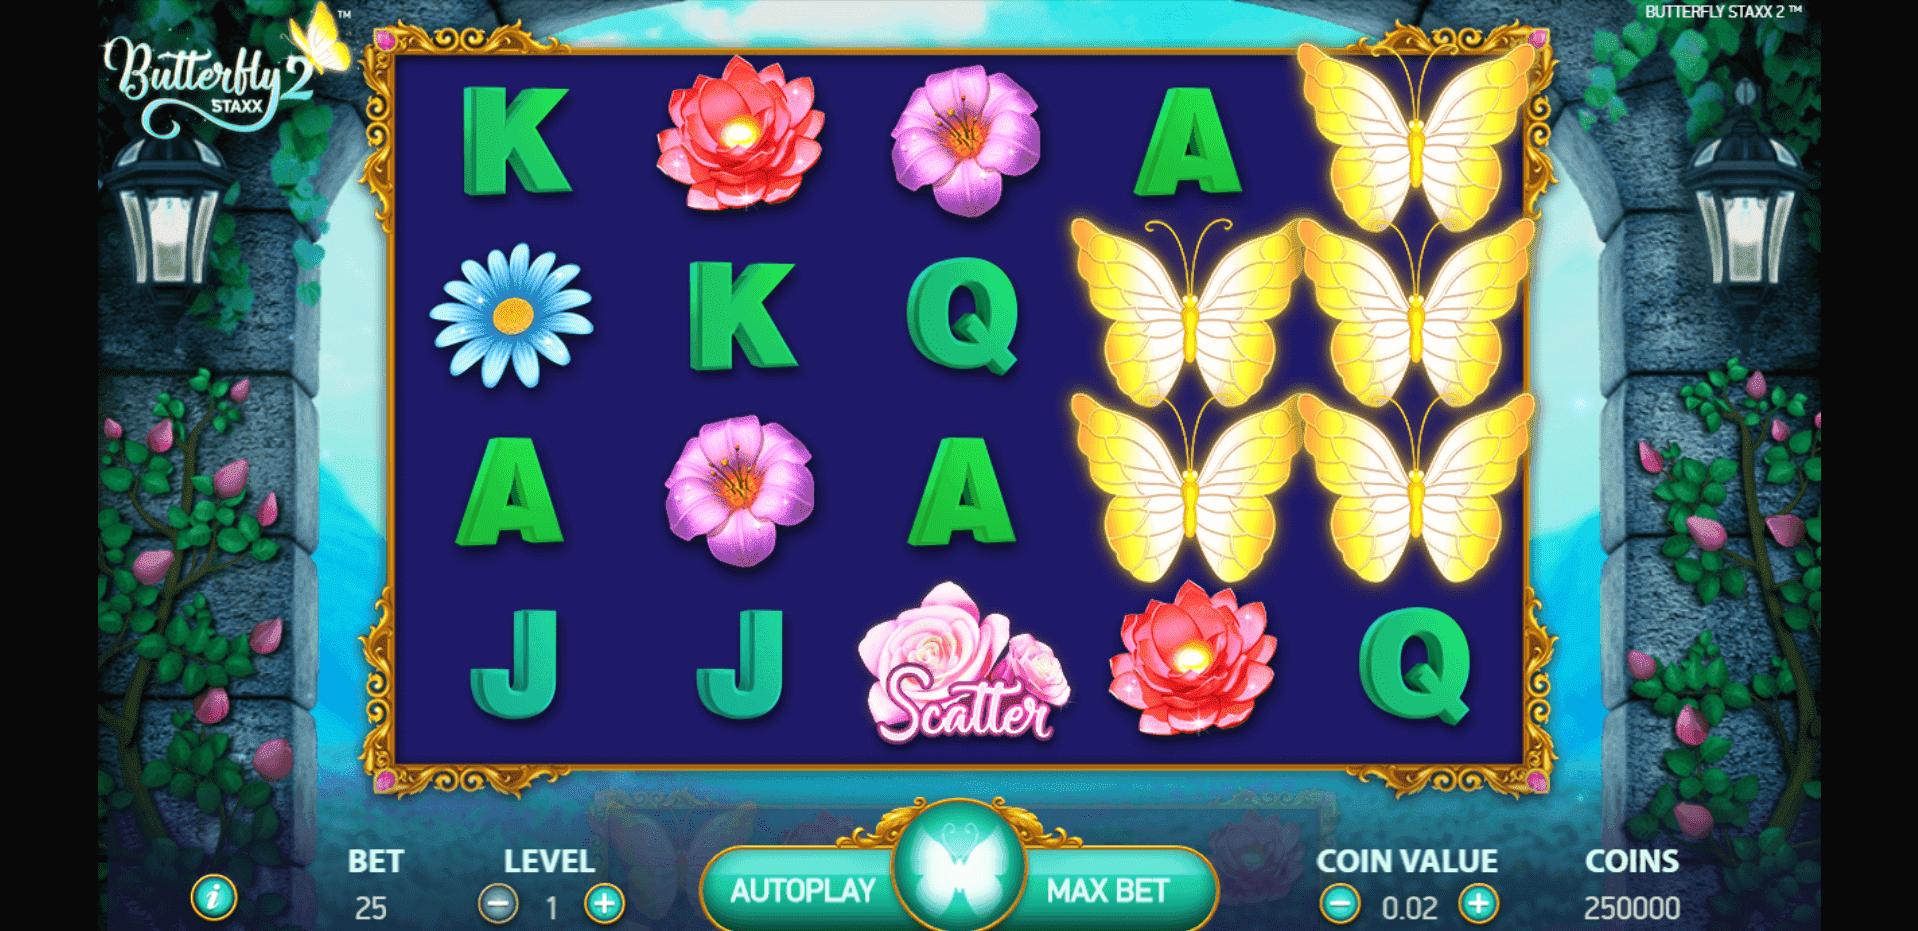 Butterfly Staxx 2 slot machine screenshot